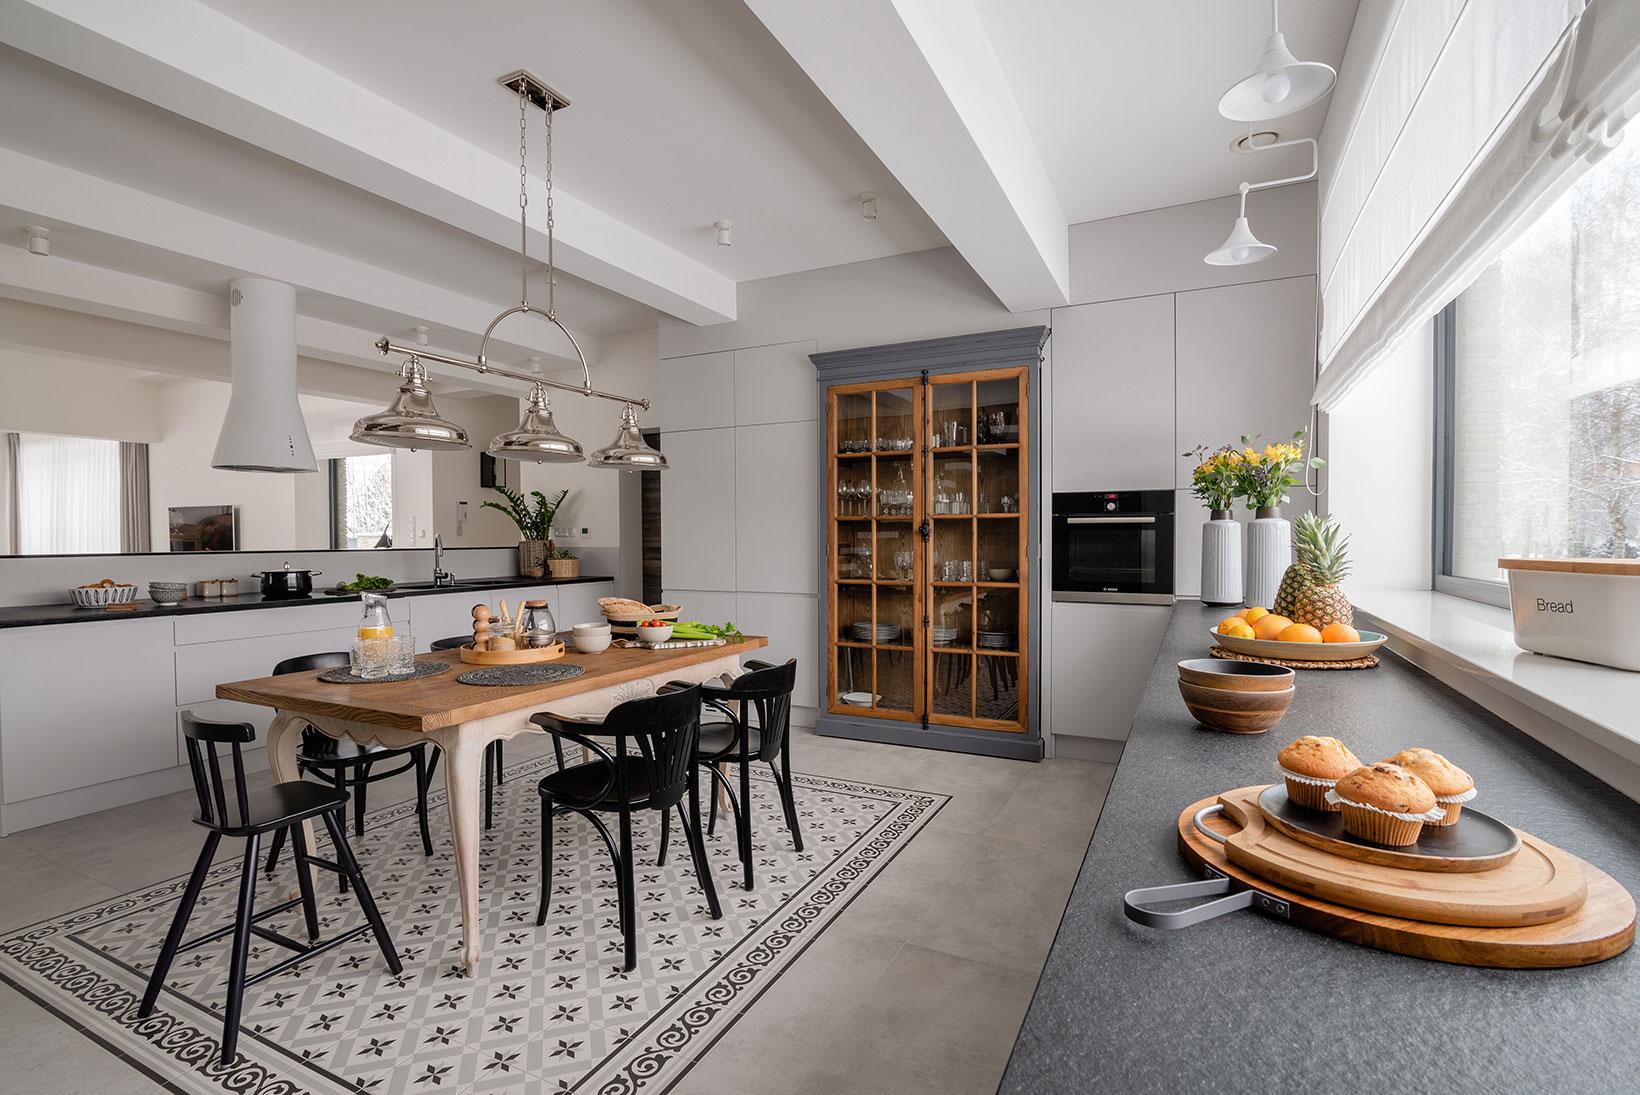 Projekt wnętrza kuchni i jadalni, dom w Lubawie, VProjekt